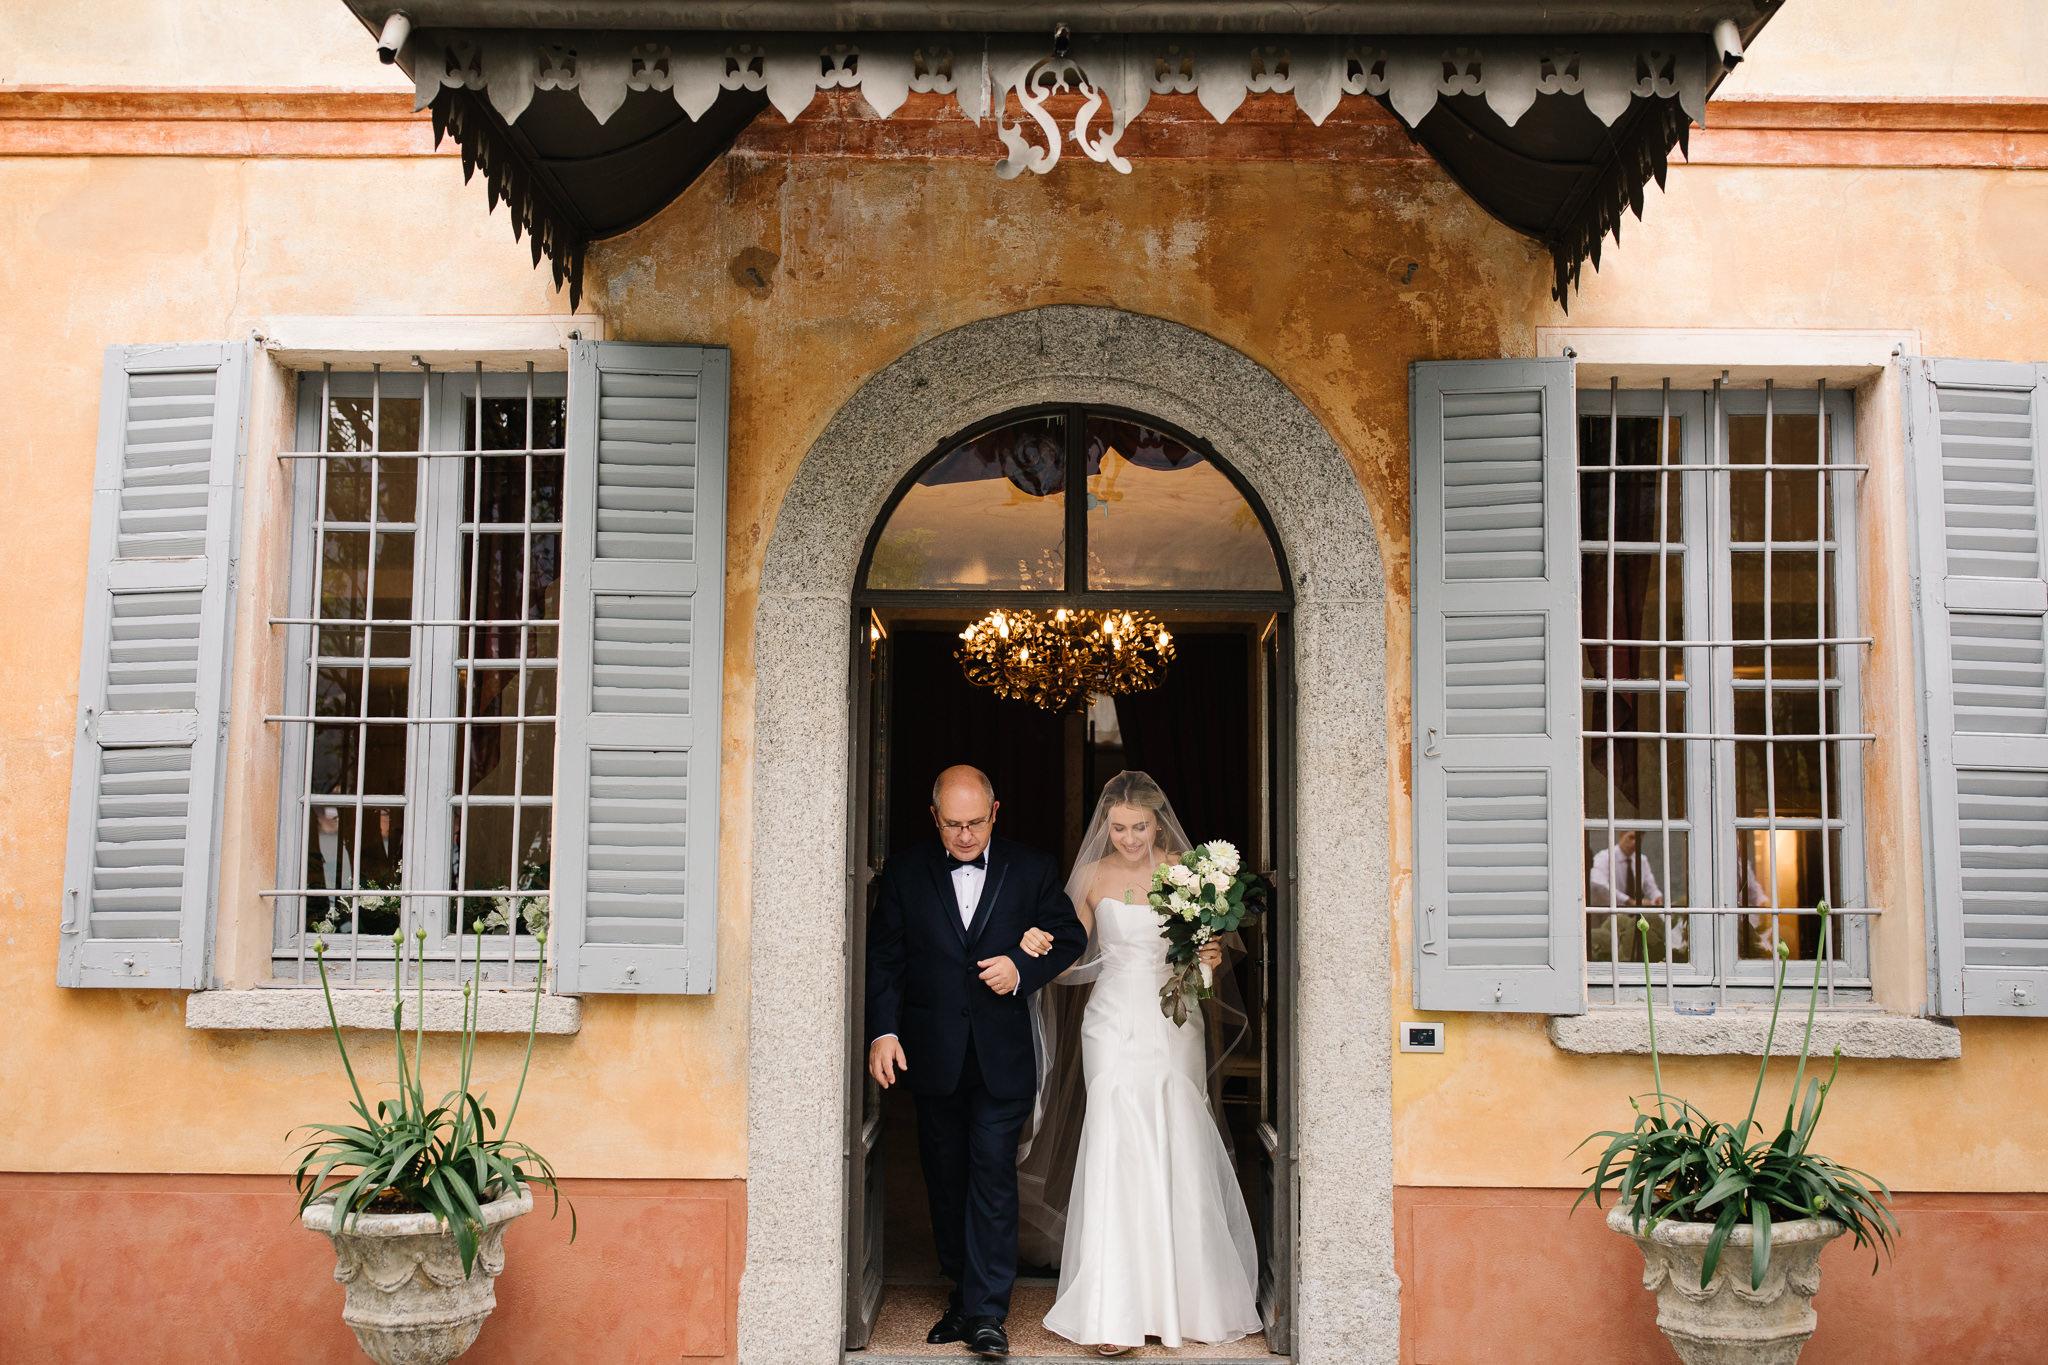 Xyris 5 - fited boned romantic strapless wedding dress.jpg